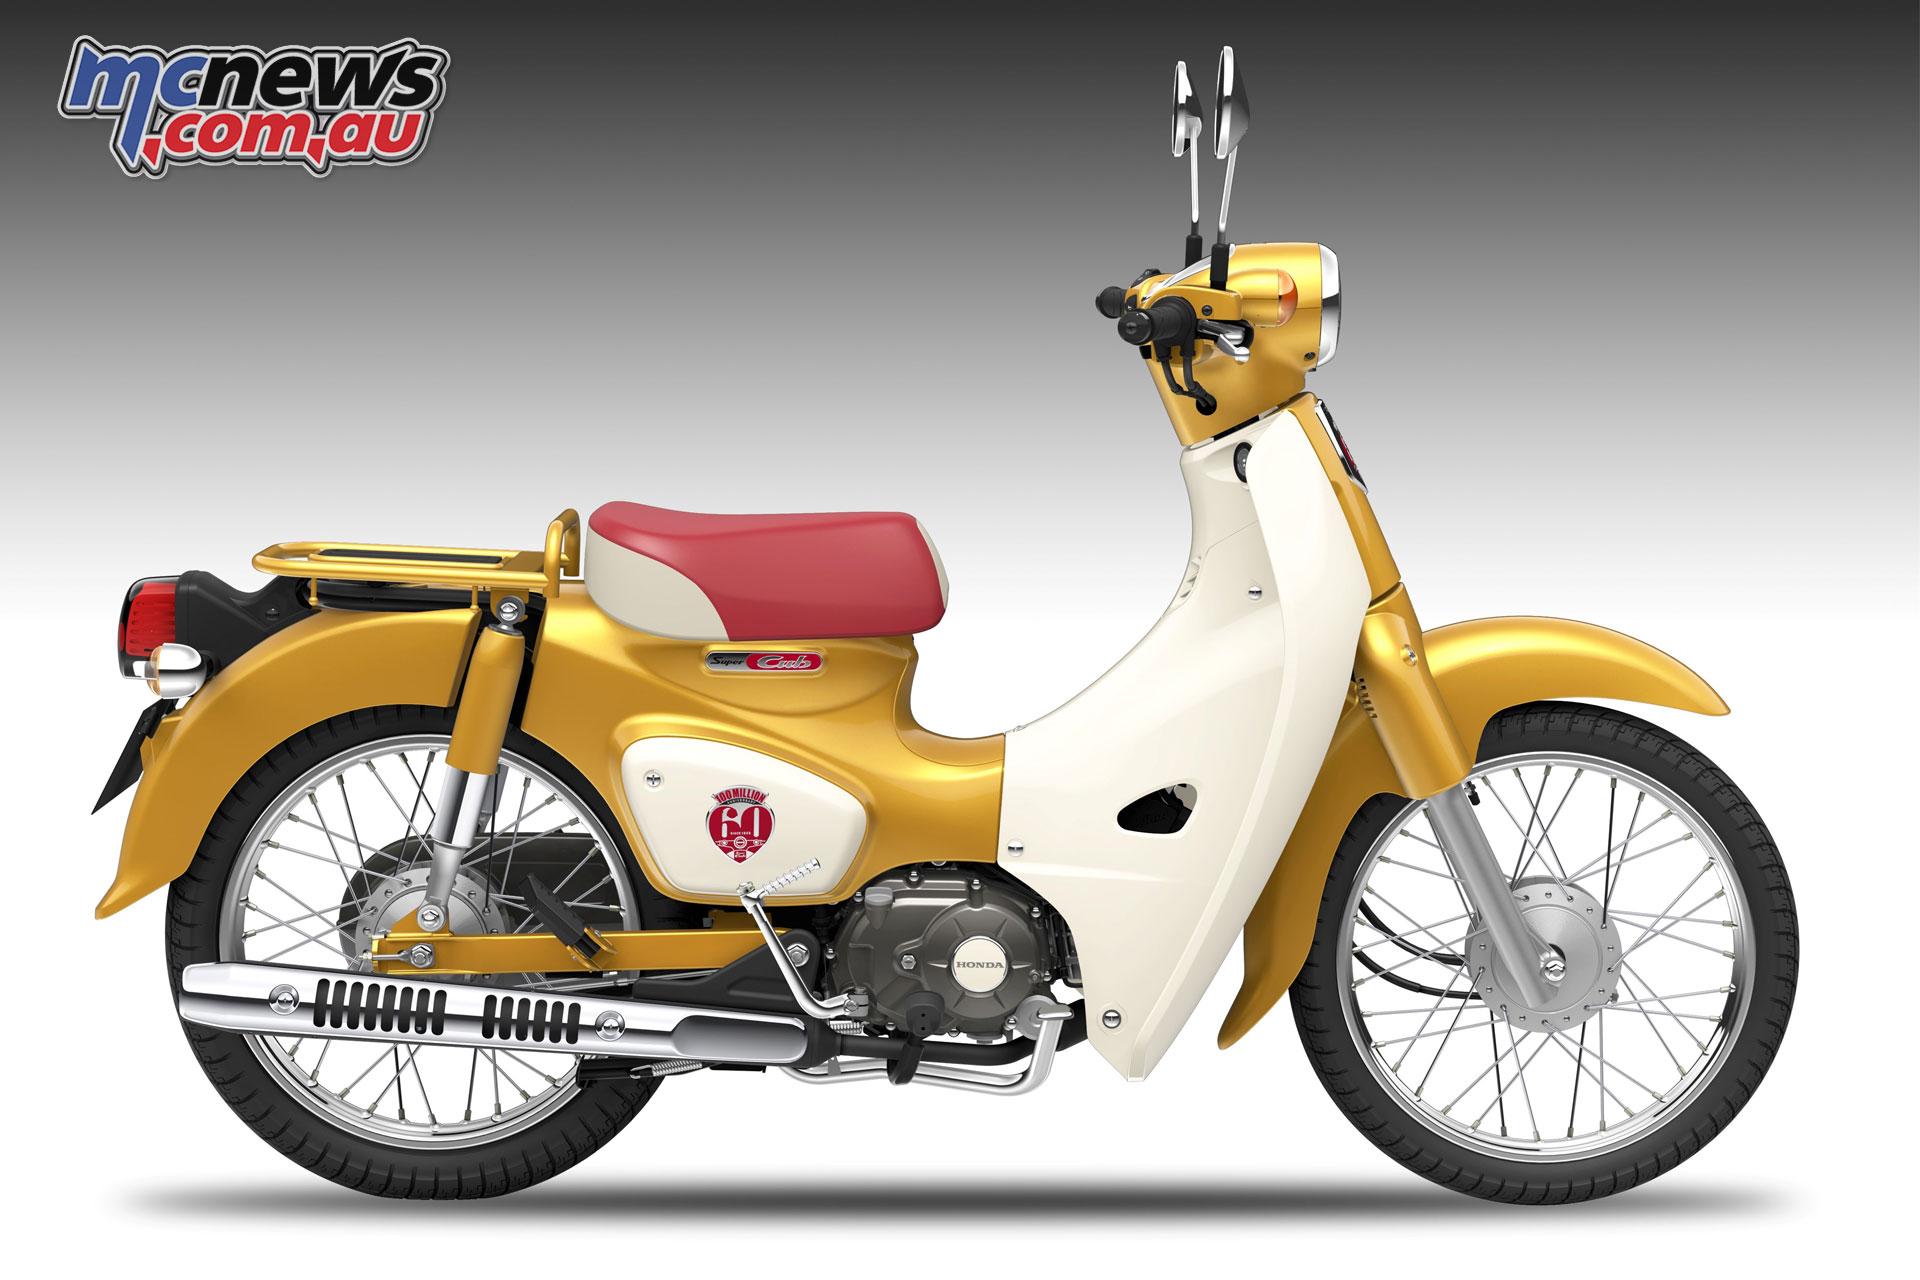 Honda Super Cub 110 Commemorative Edition Concept Mcnews Com Au